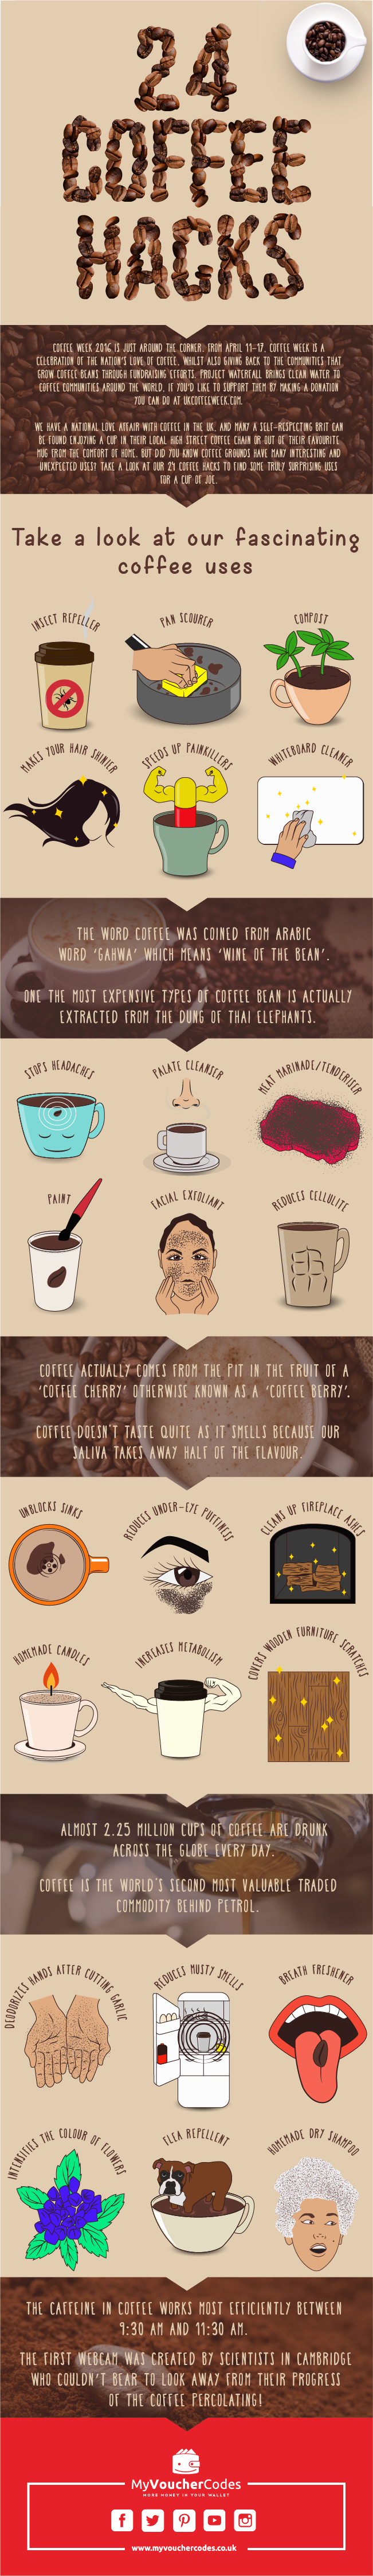 Coffee Hacks infographic